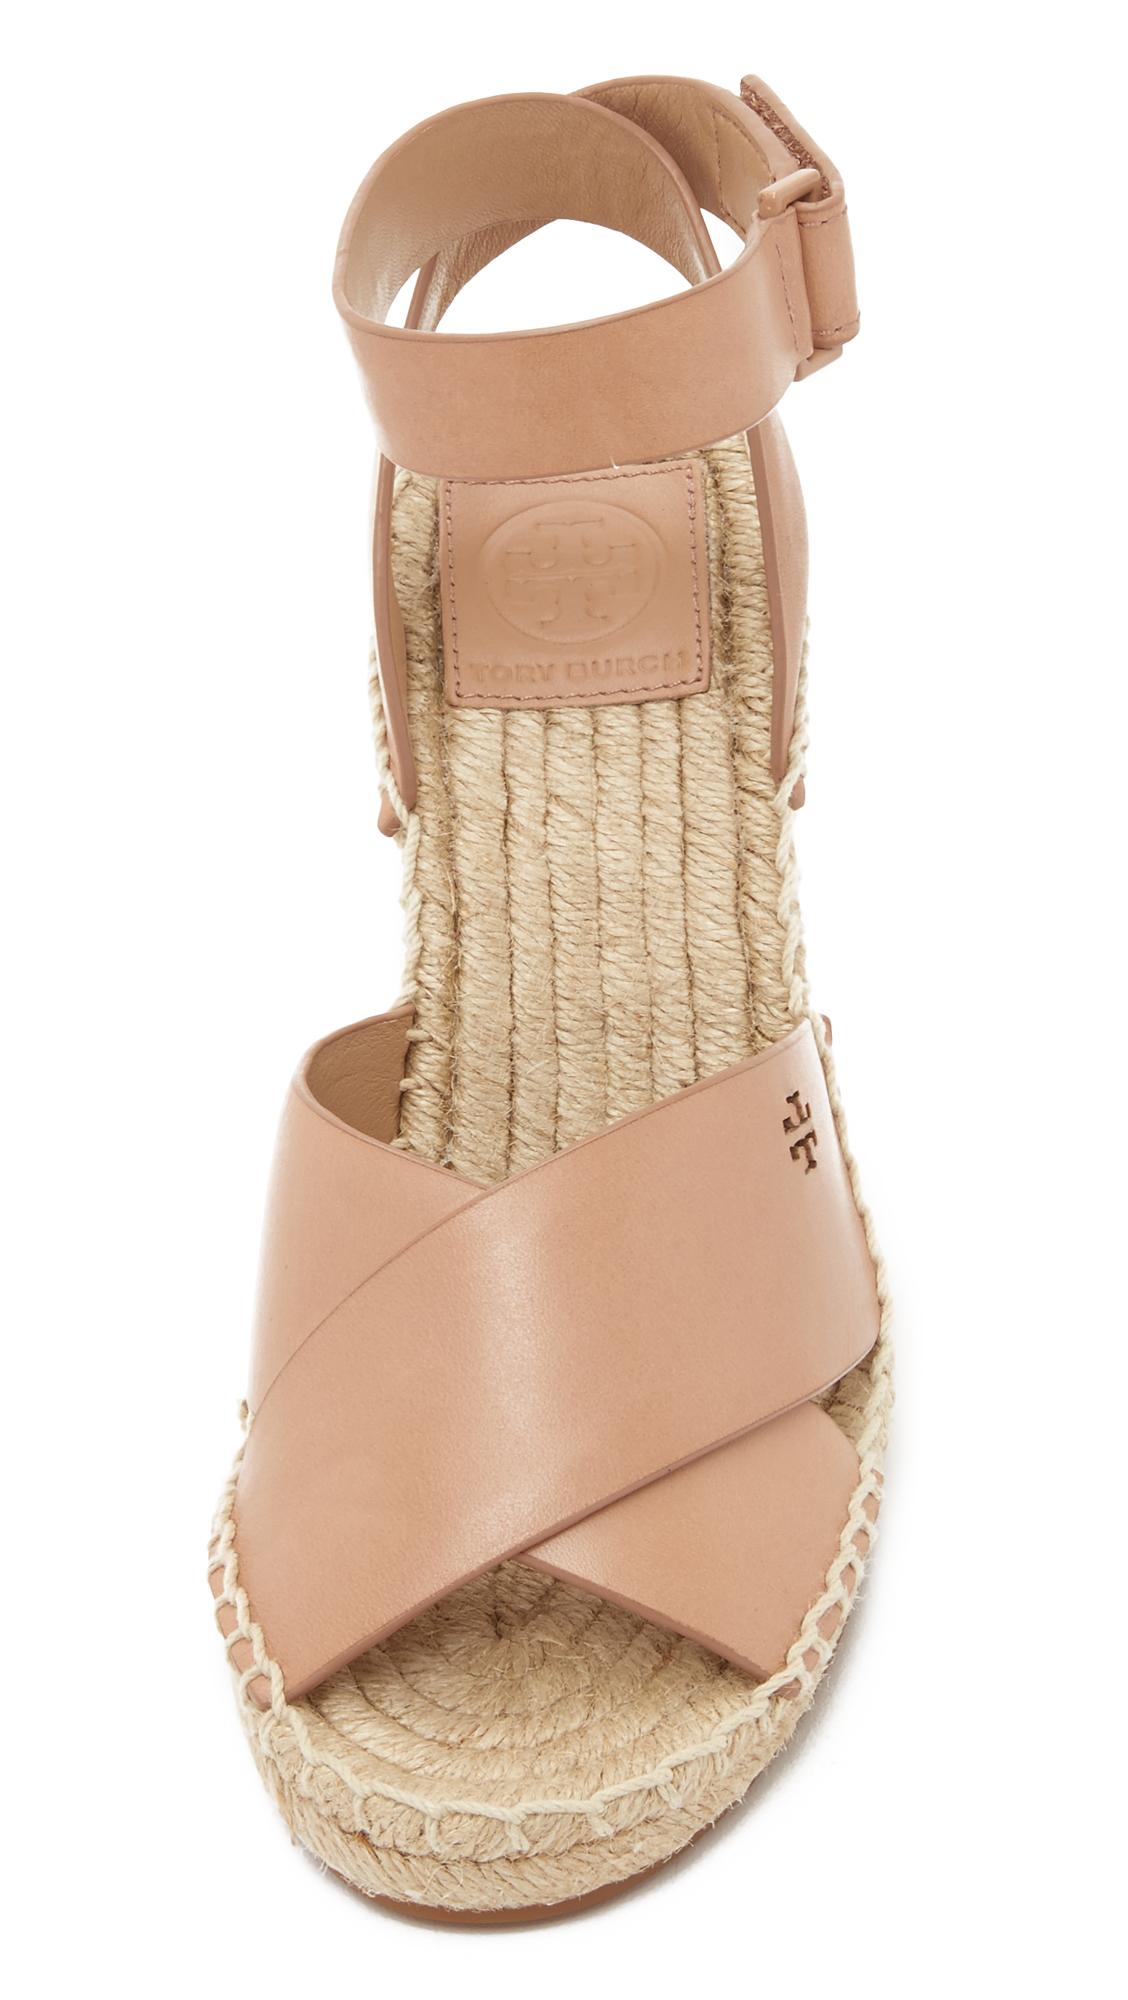 35d8be164ffbf4 Tory Burch Bima Wedge Espadrille Sandals